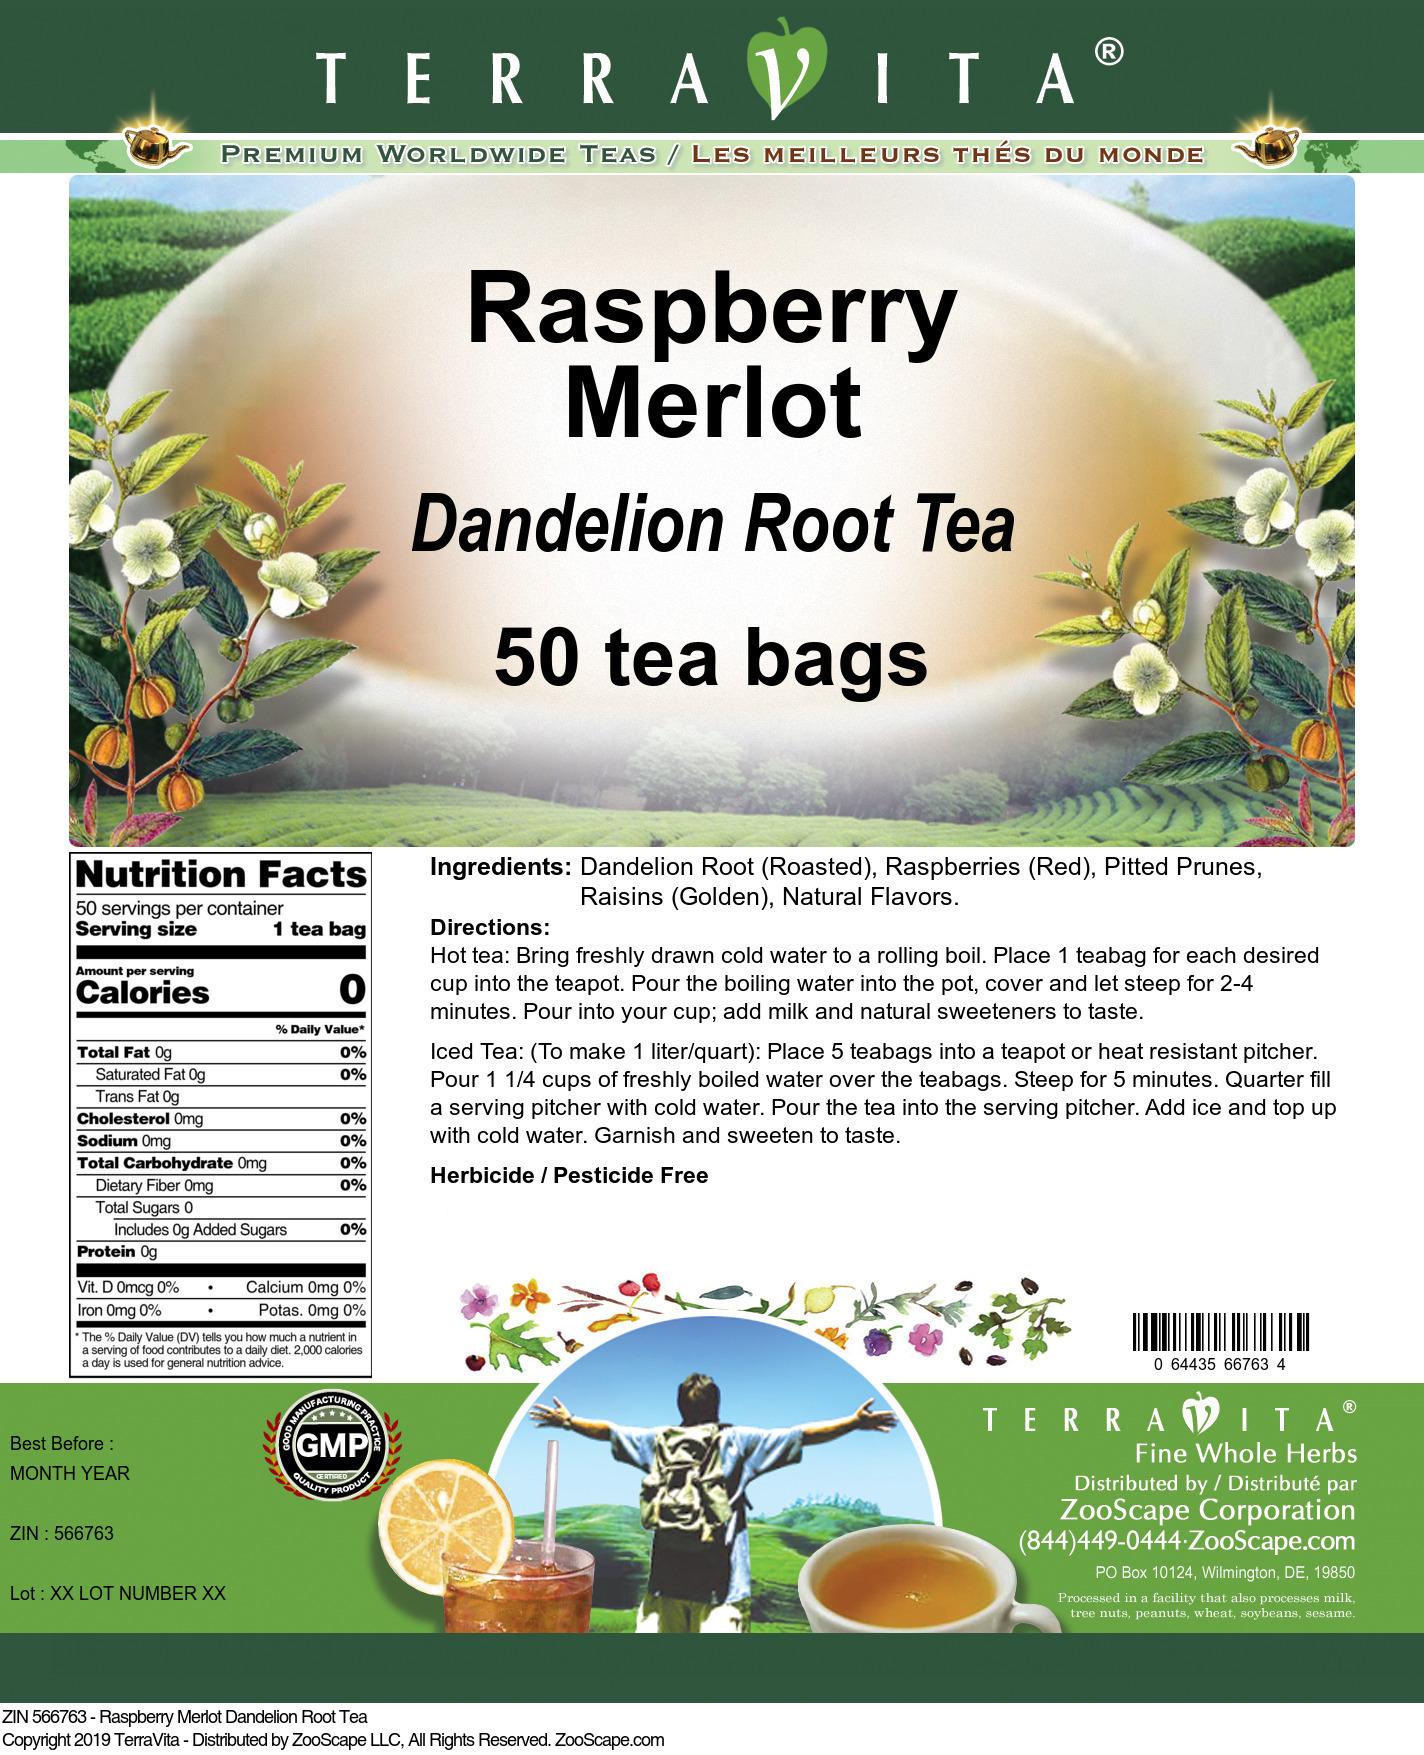 Raspberry Merlot Dandelion Root Tea